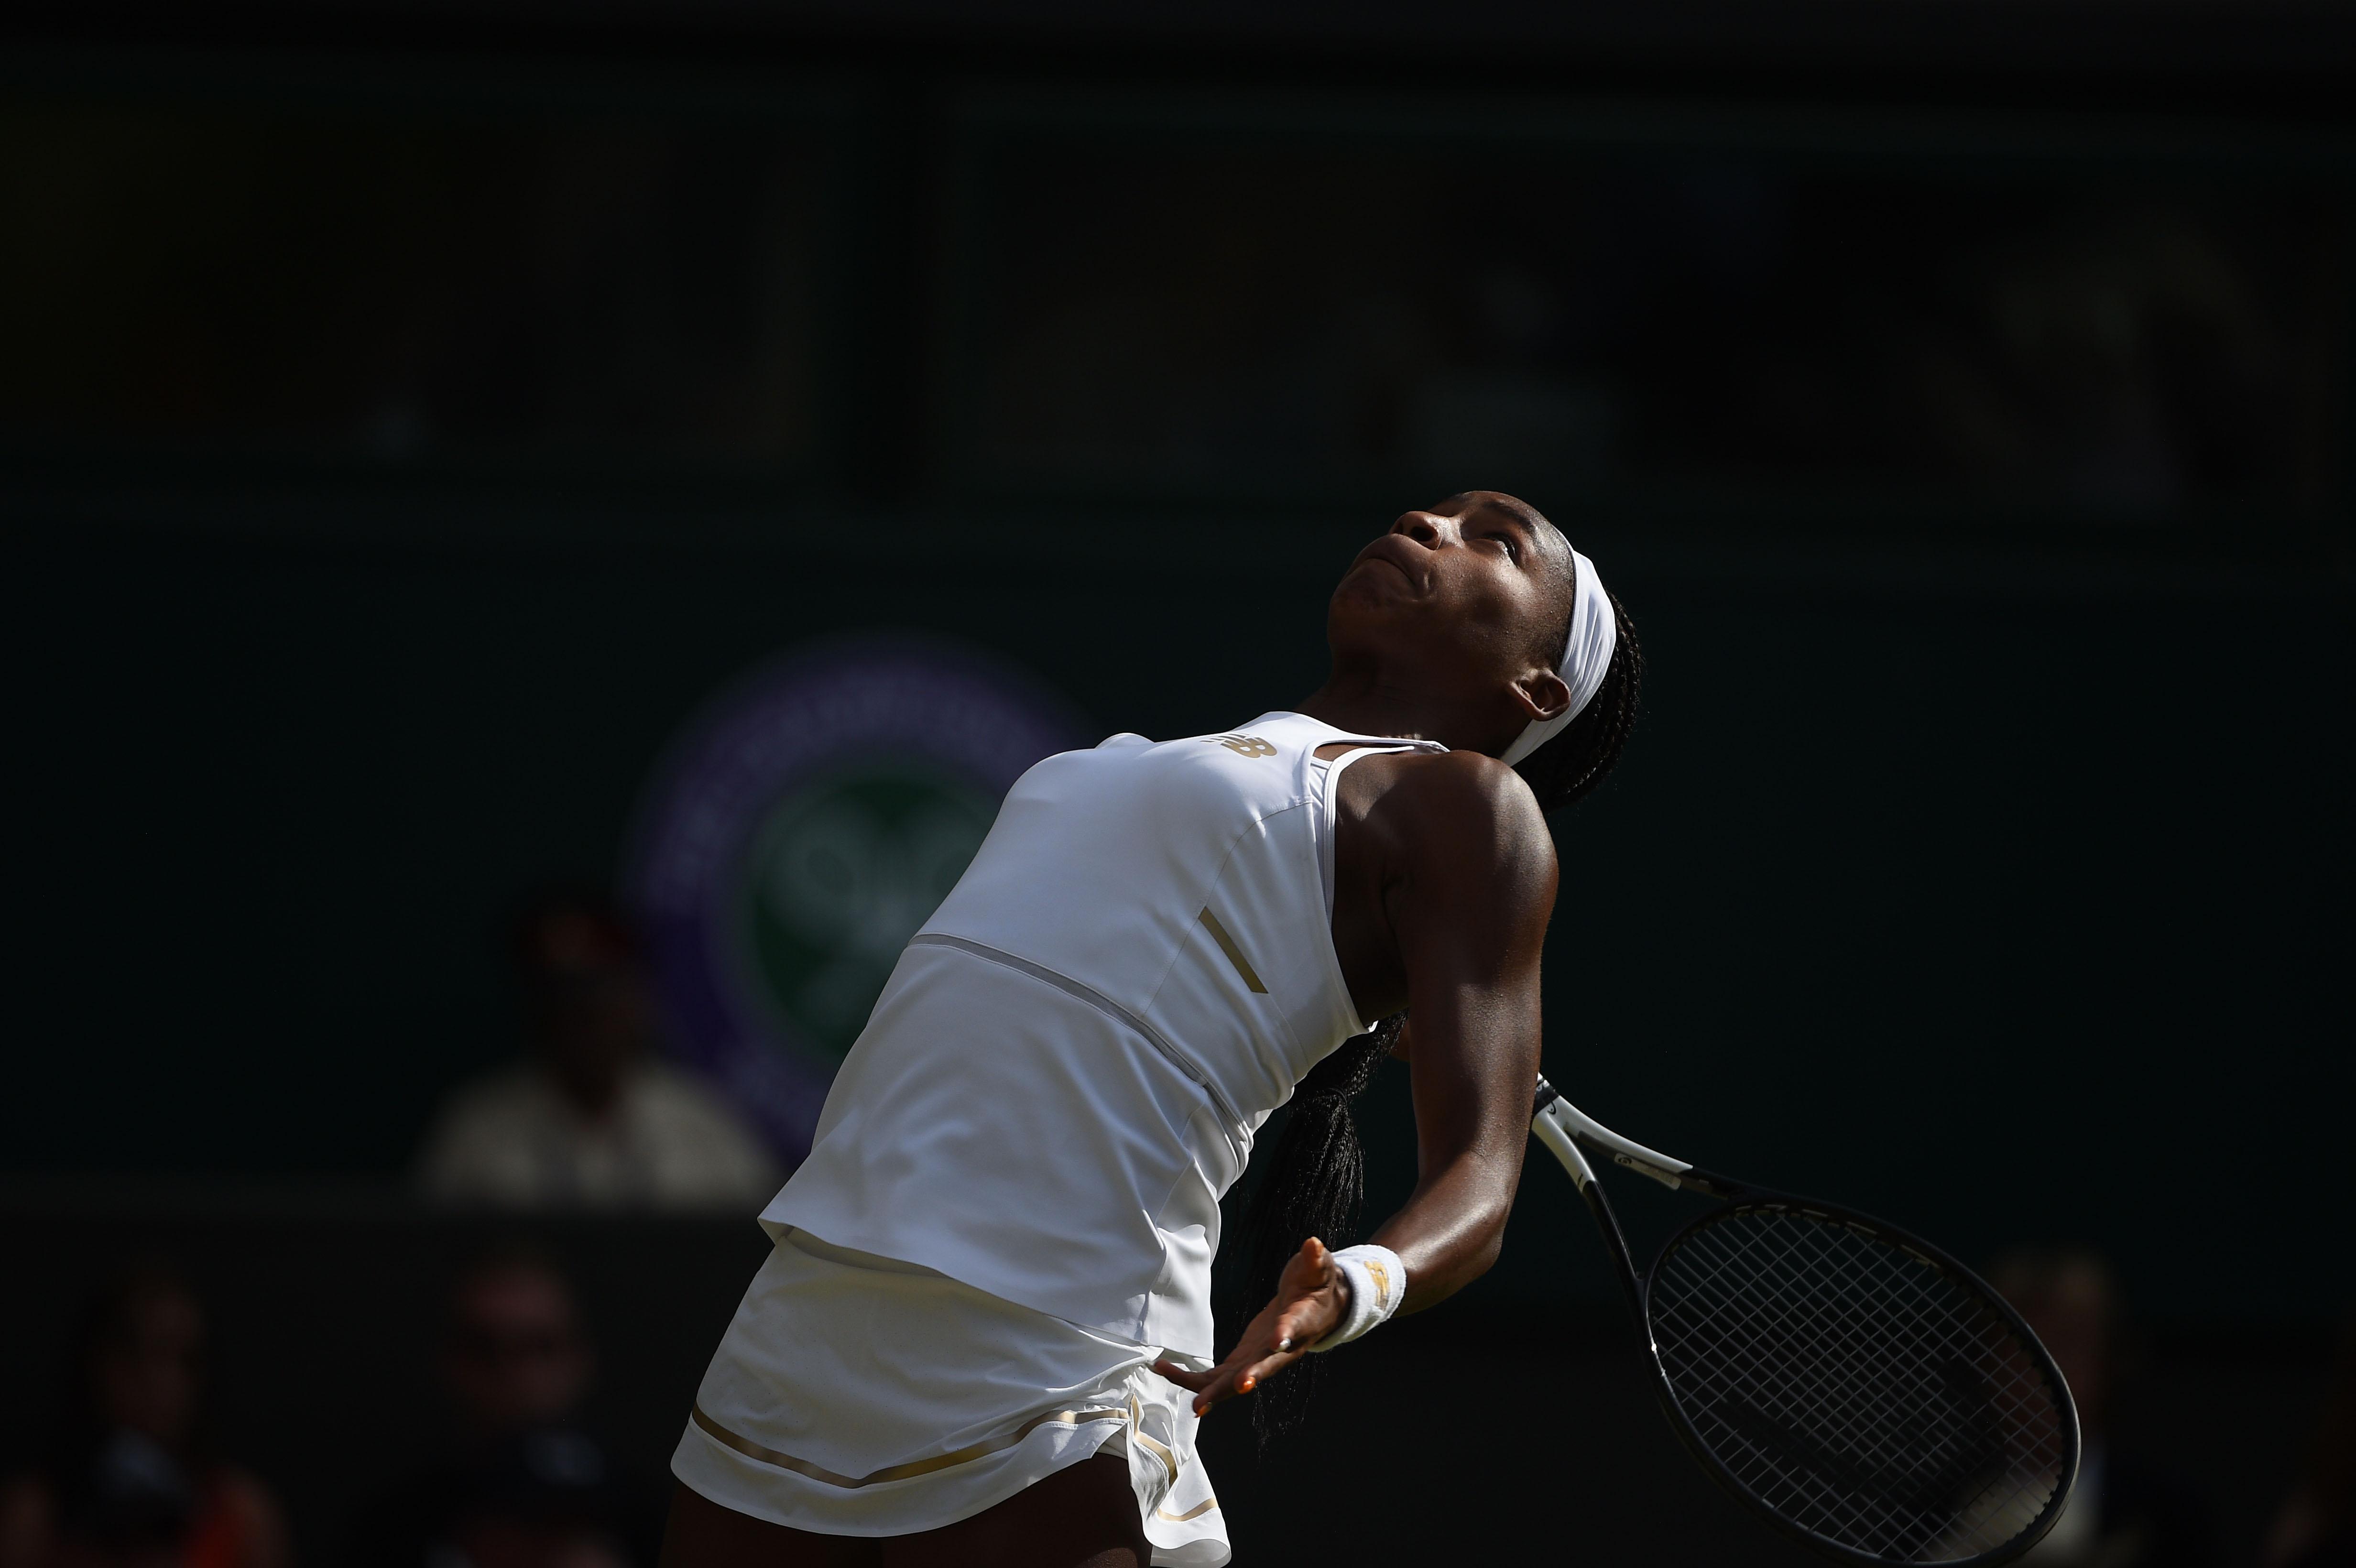 Cori Gauff serving in the beautiful light at Wimbledon 2019